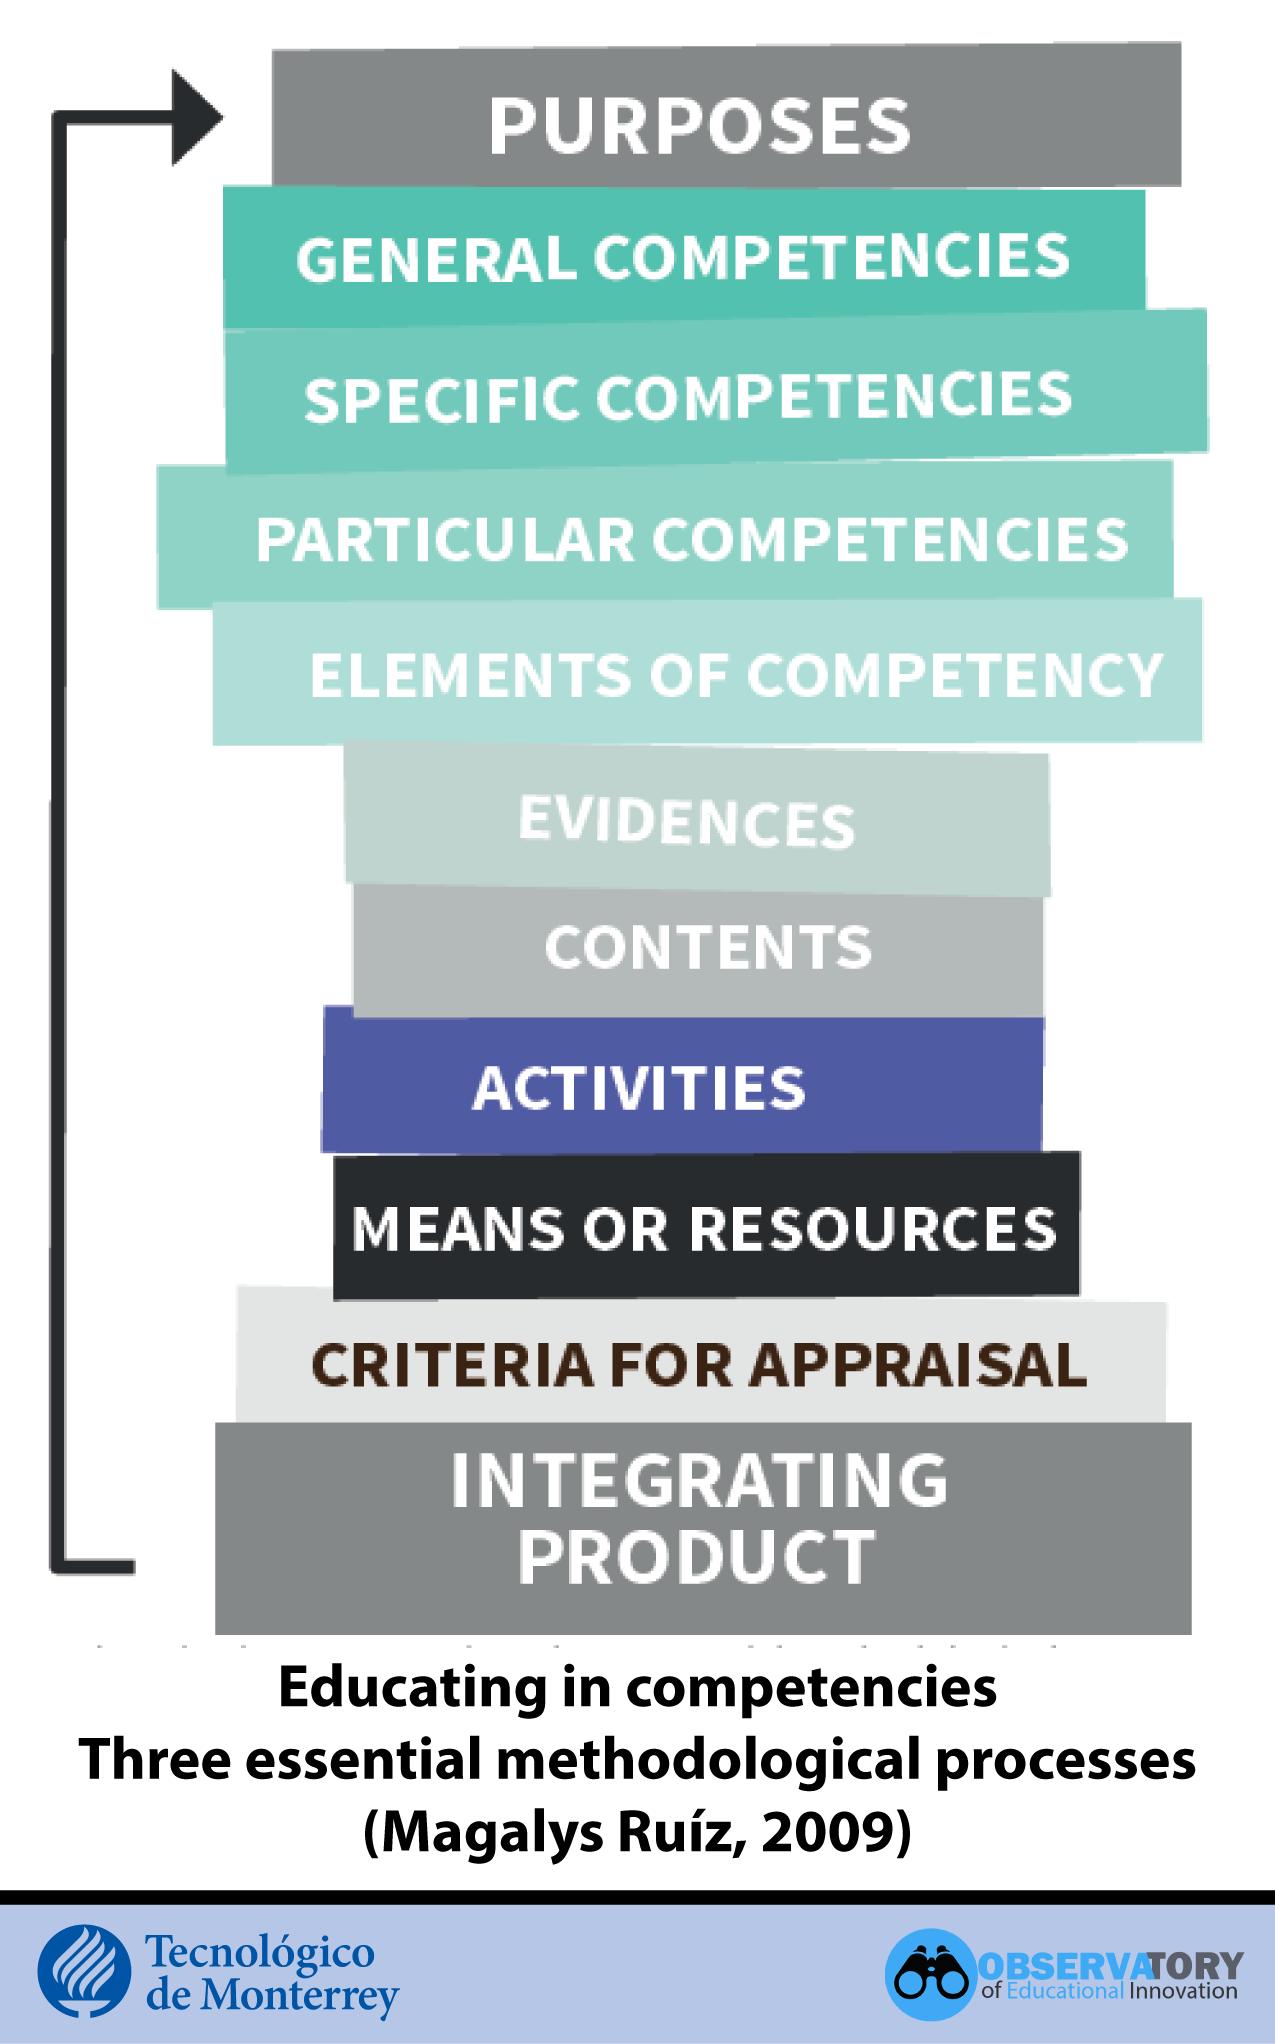 Educating in competencies